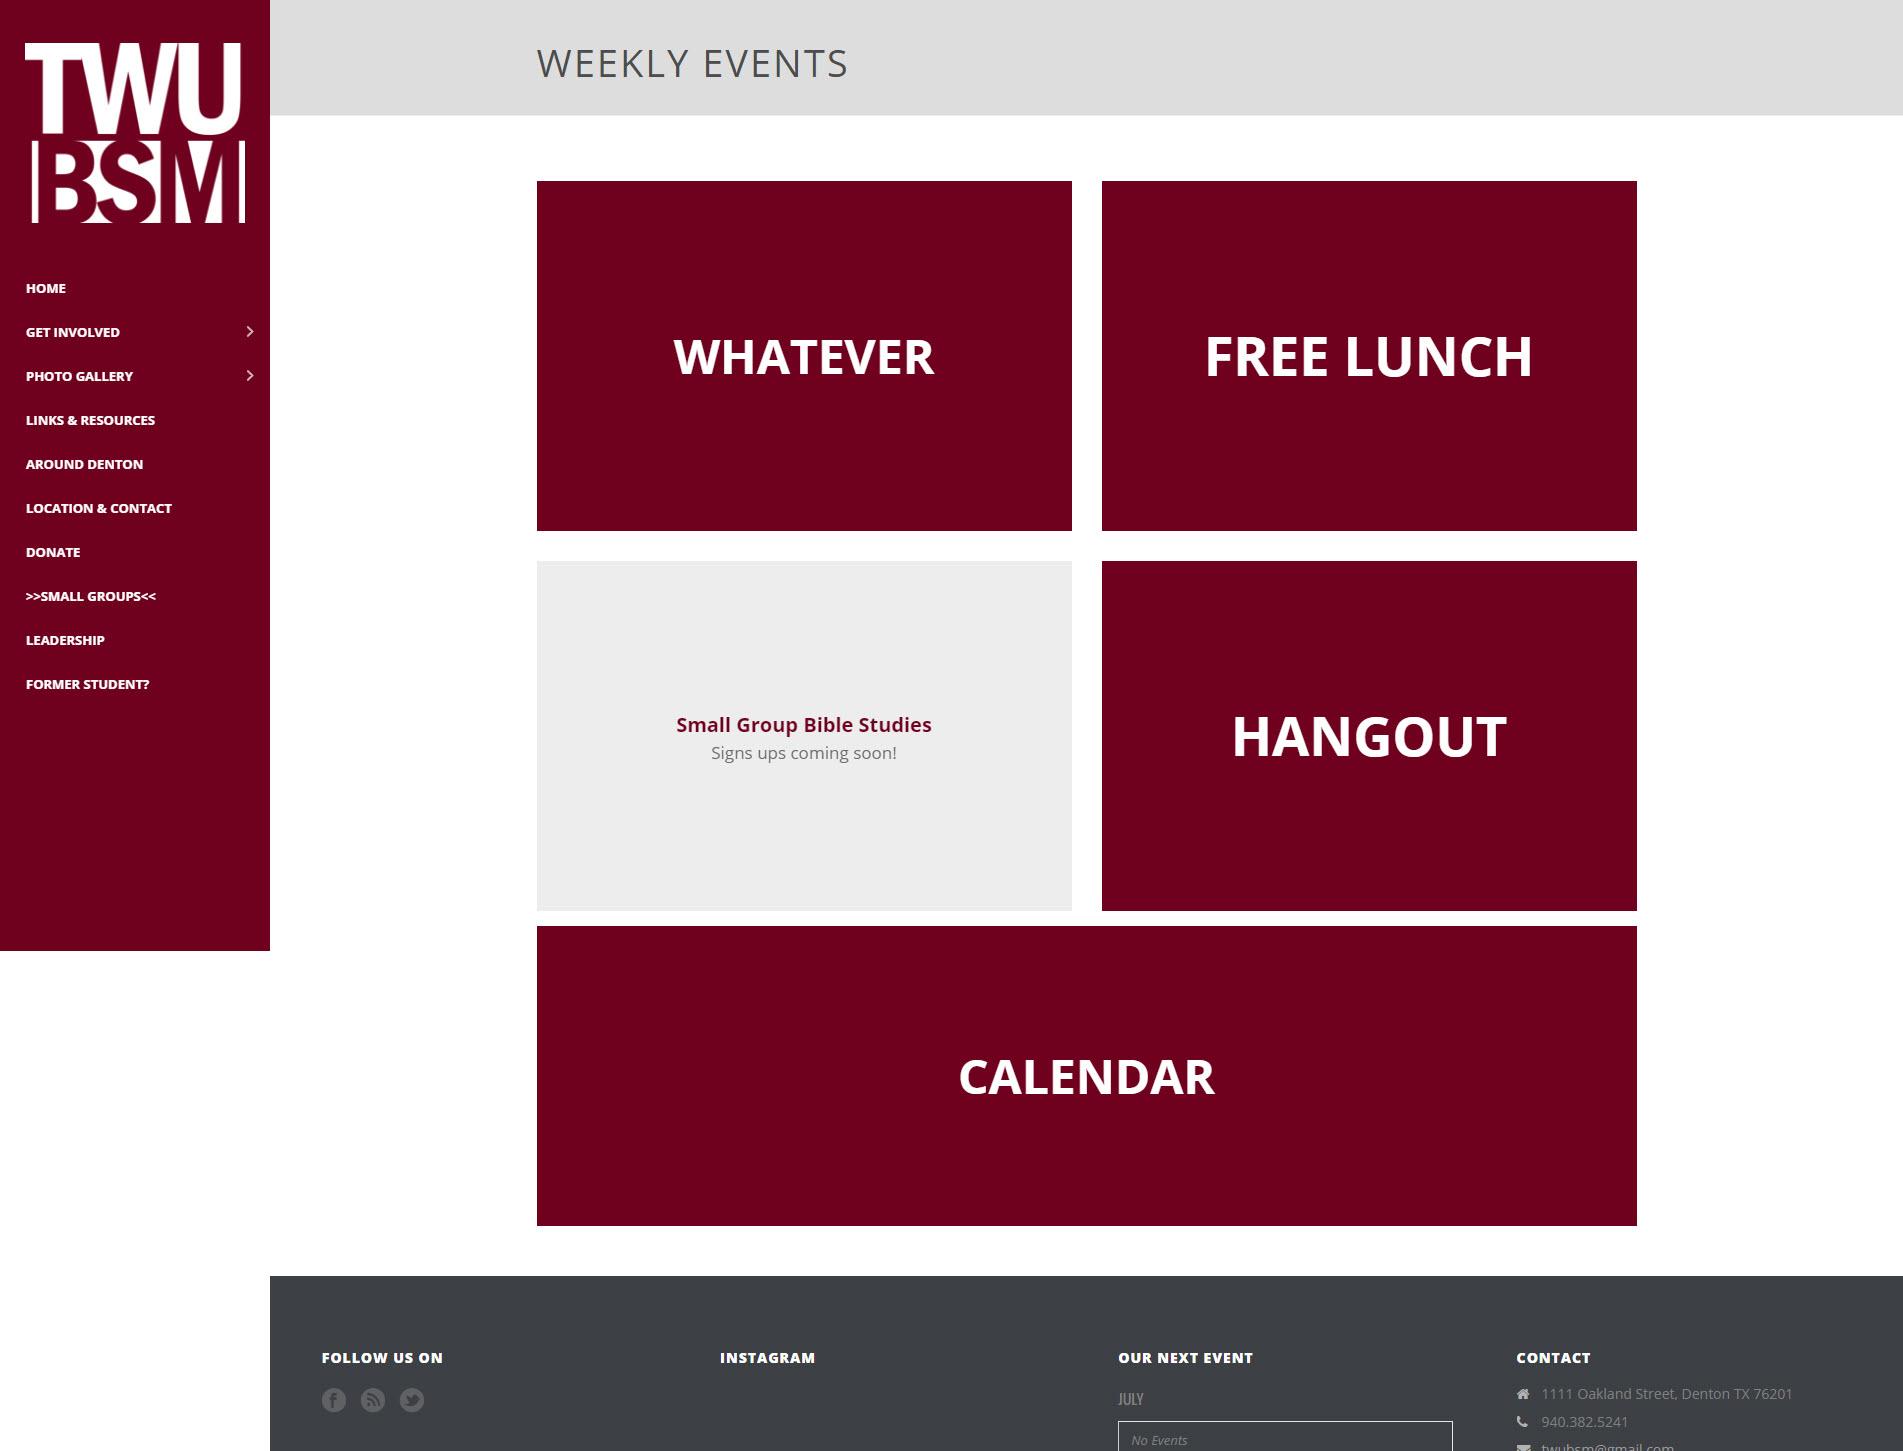 twbsm-events